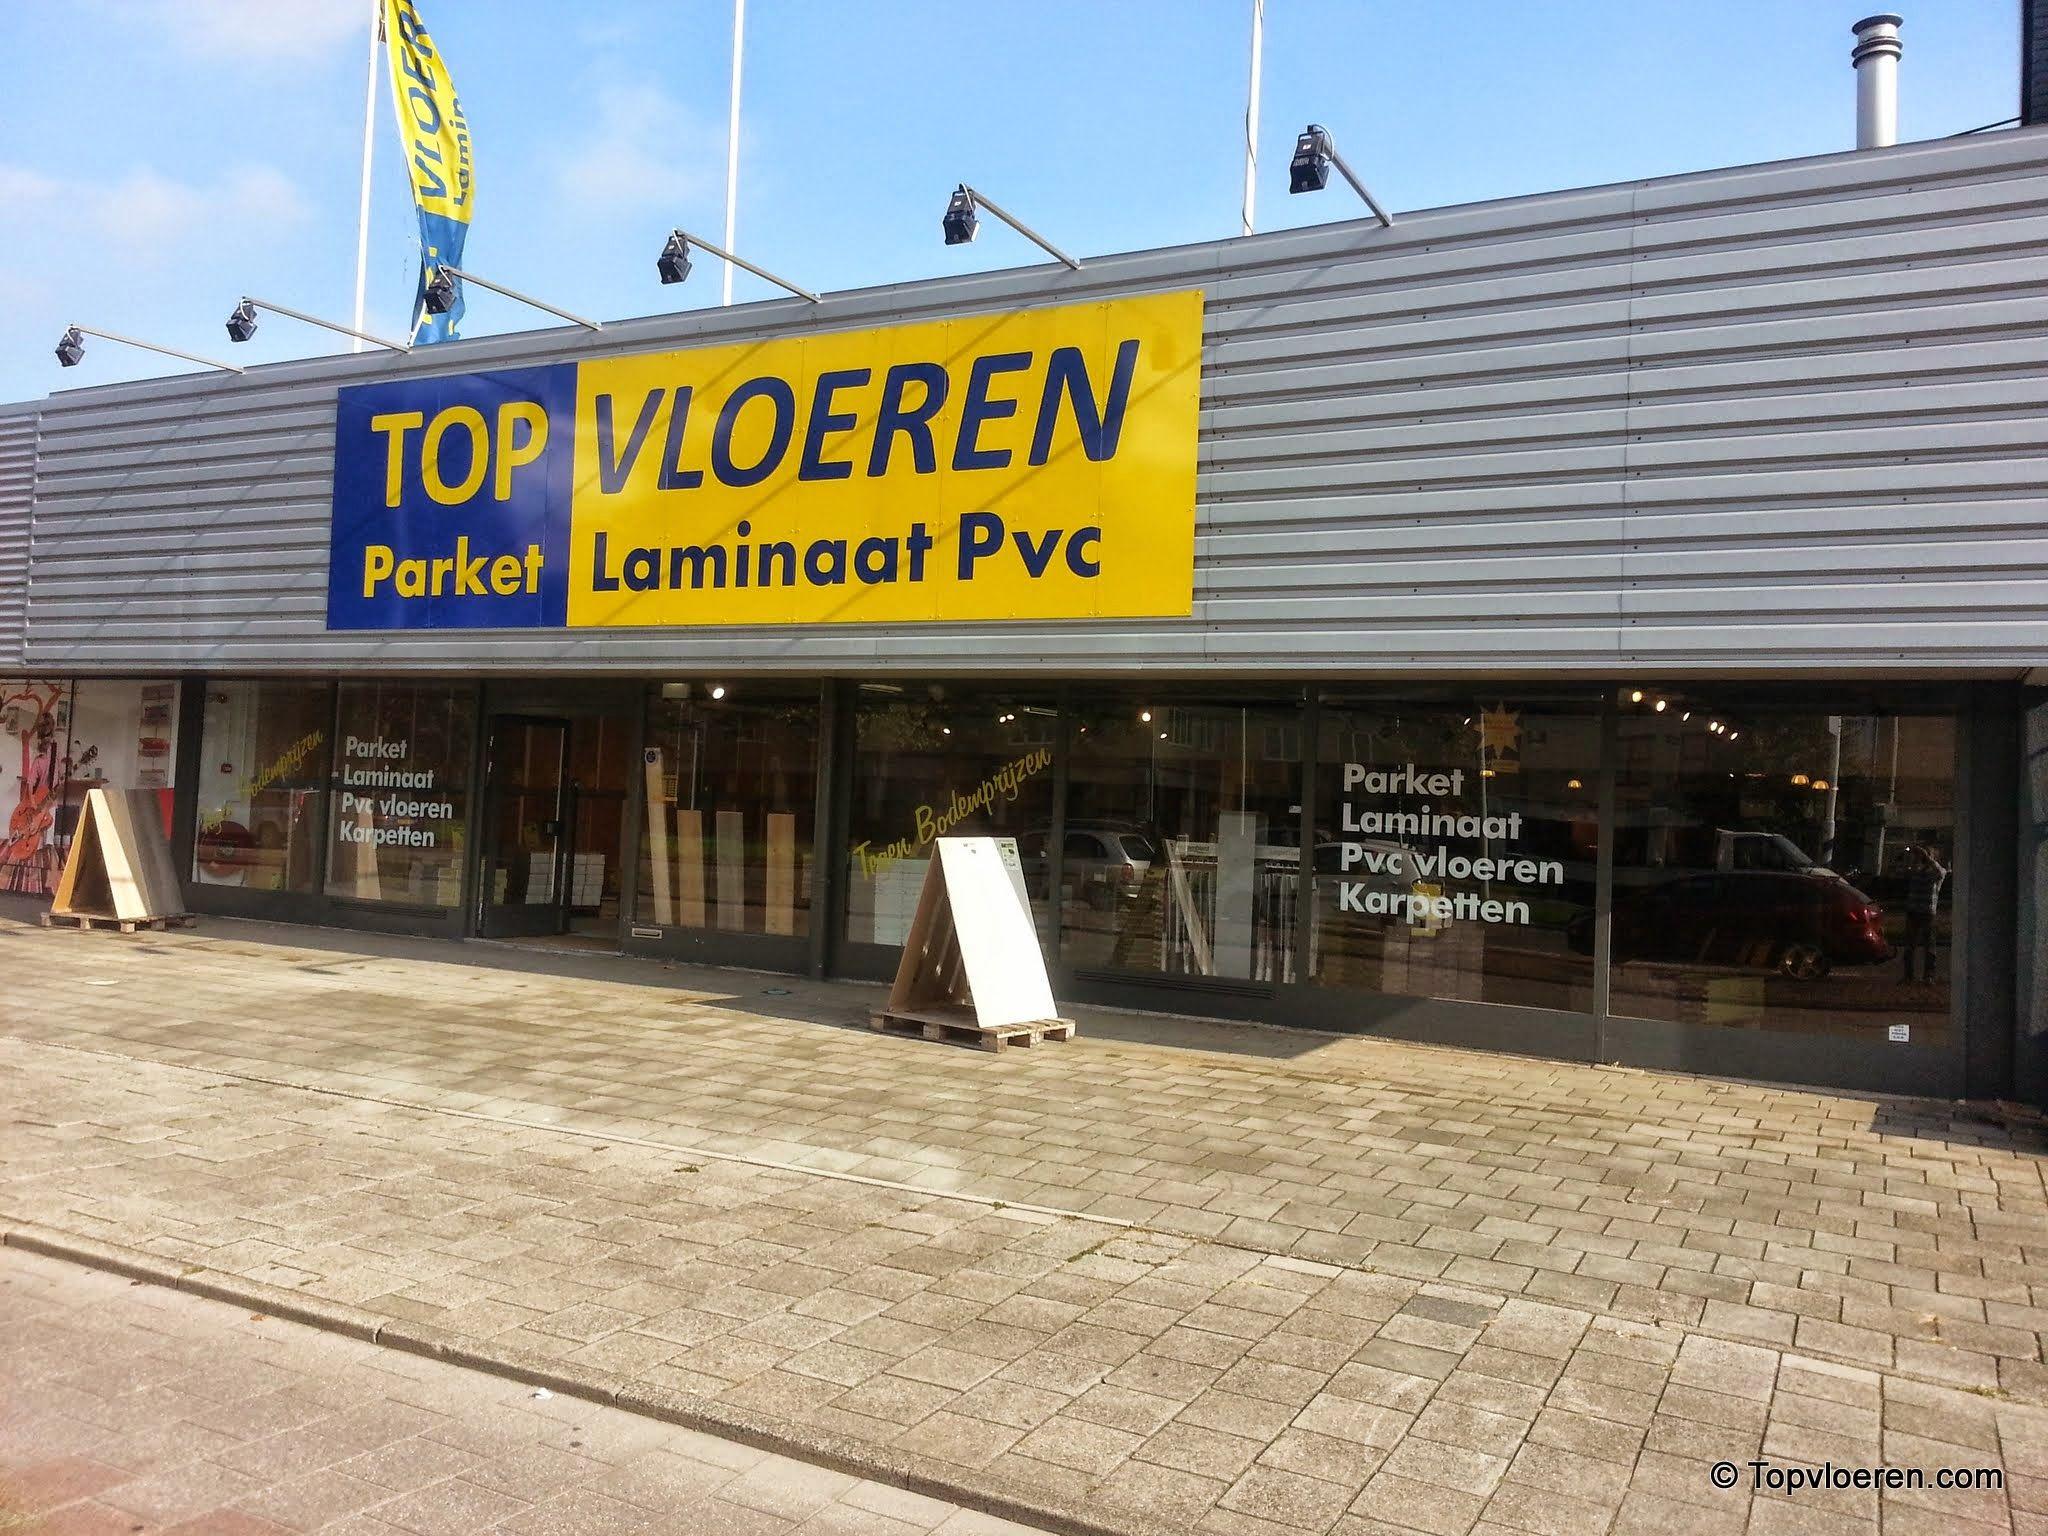 Pvc Vloeren Beuningen : Topvloeren topvloeren on pinterest